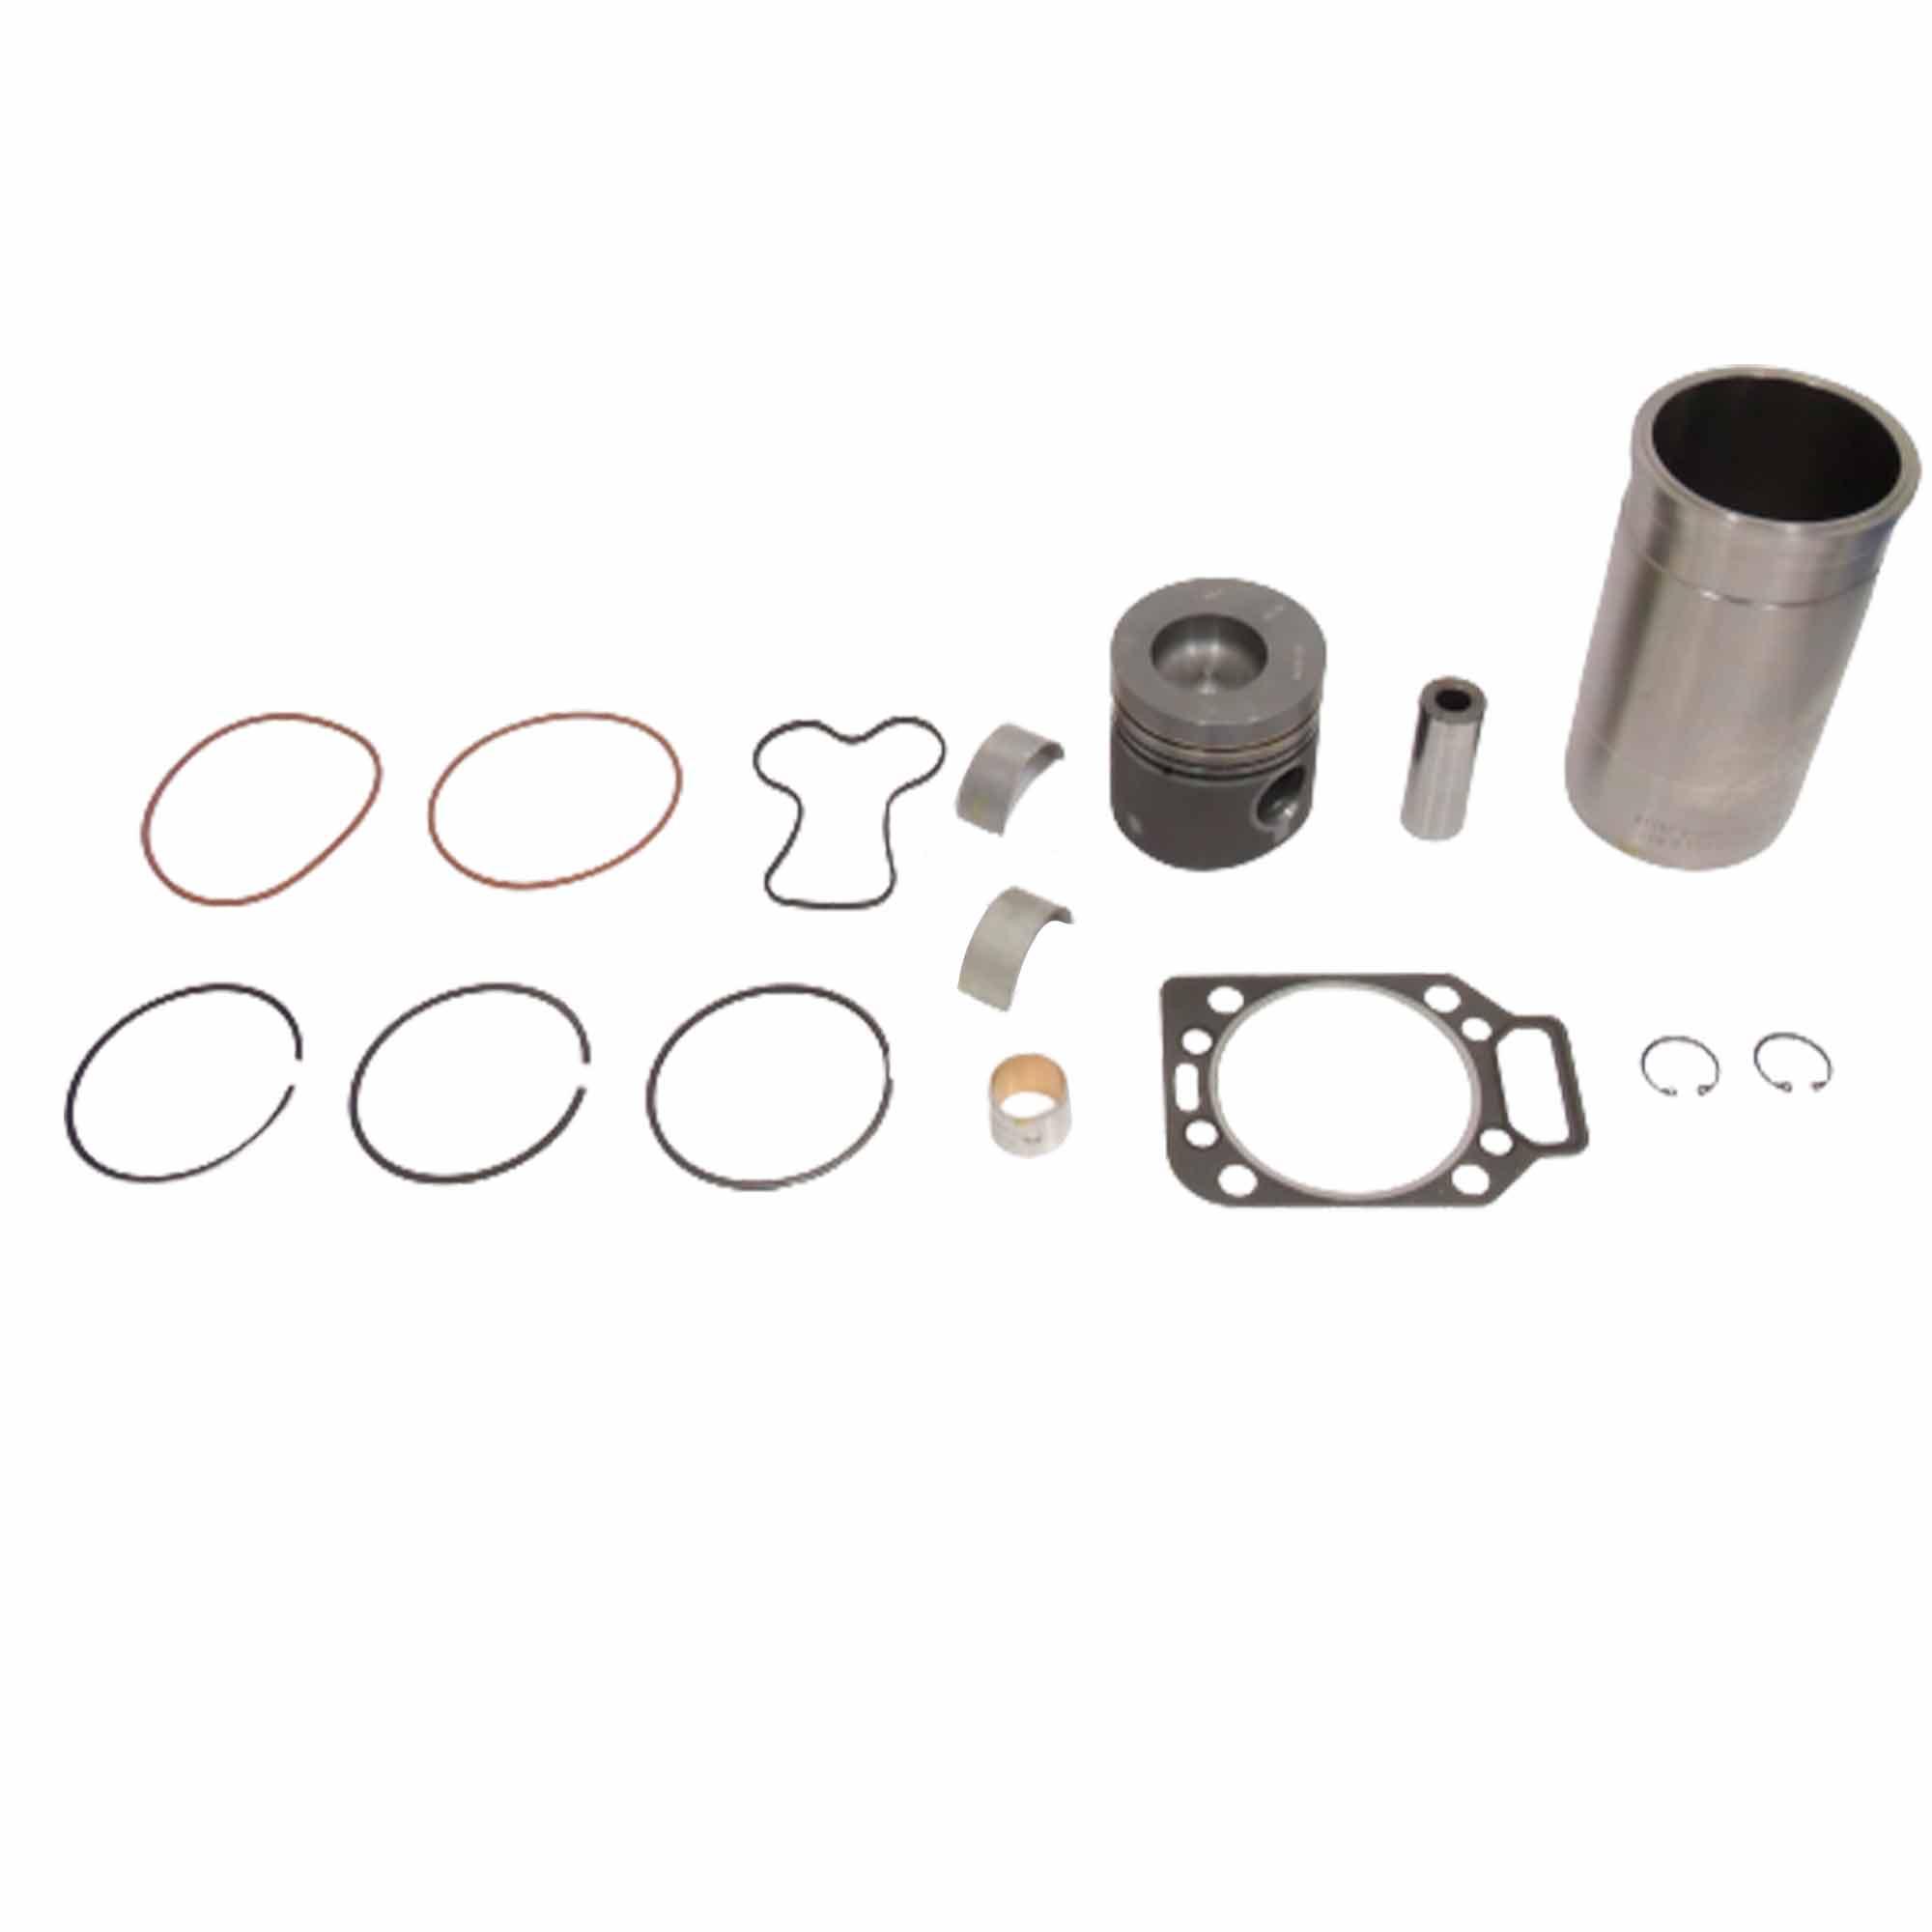 922980193018 - Kit de reparo para 1 cilindro - Super Master Kit MWM